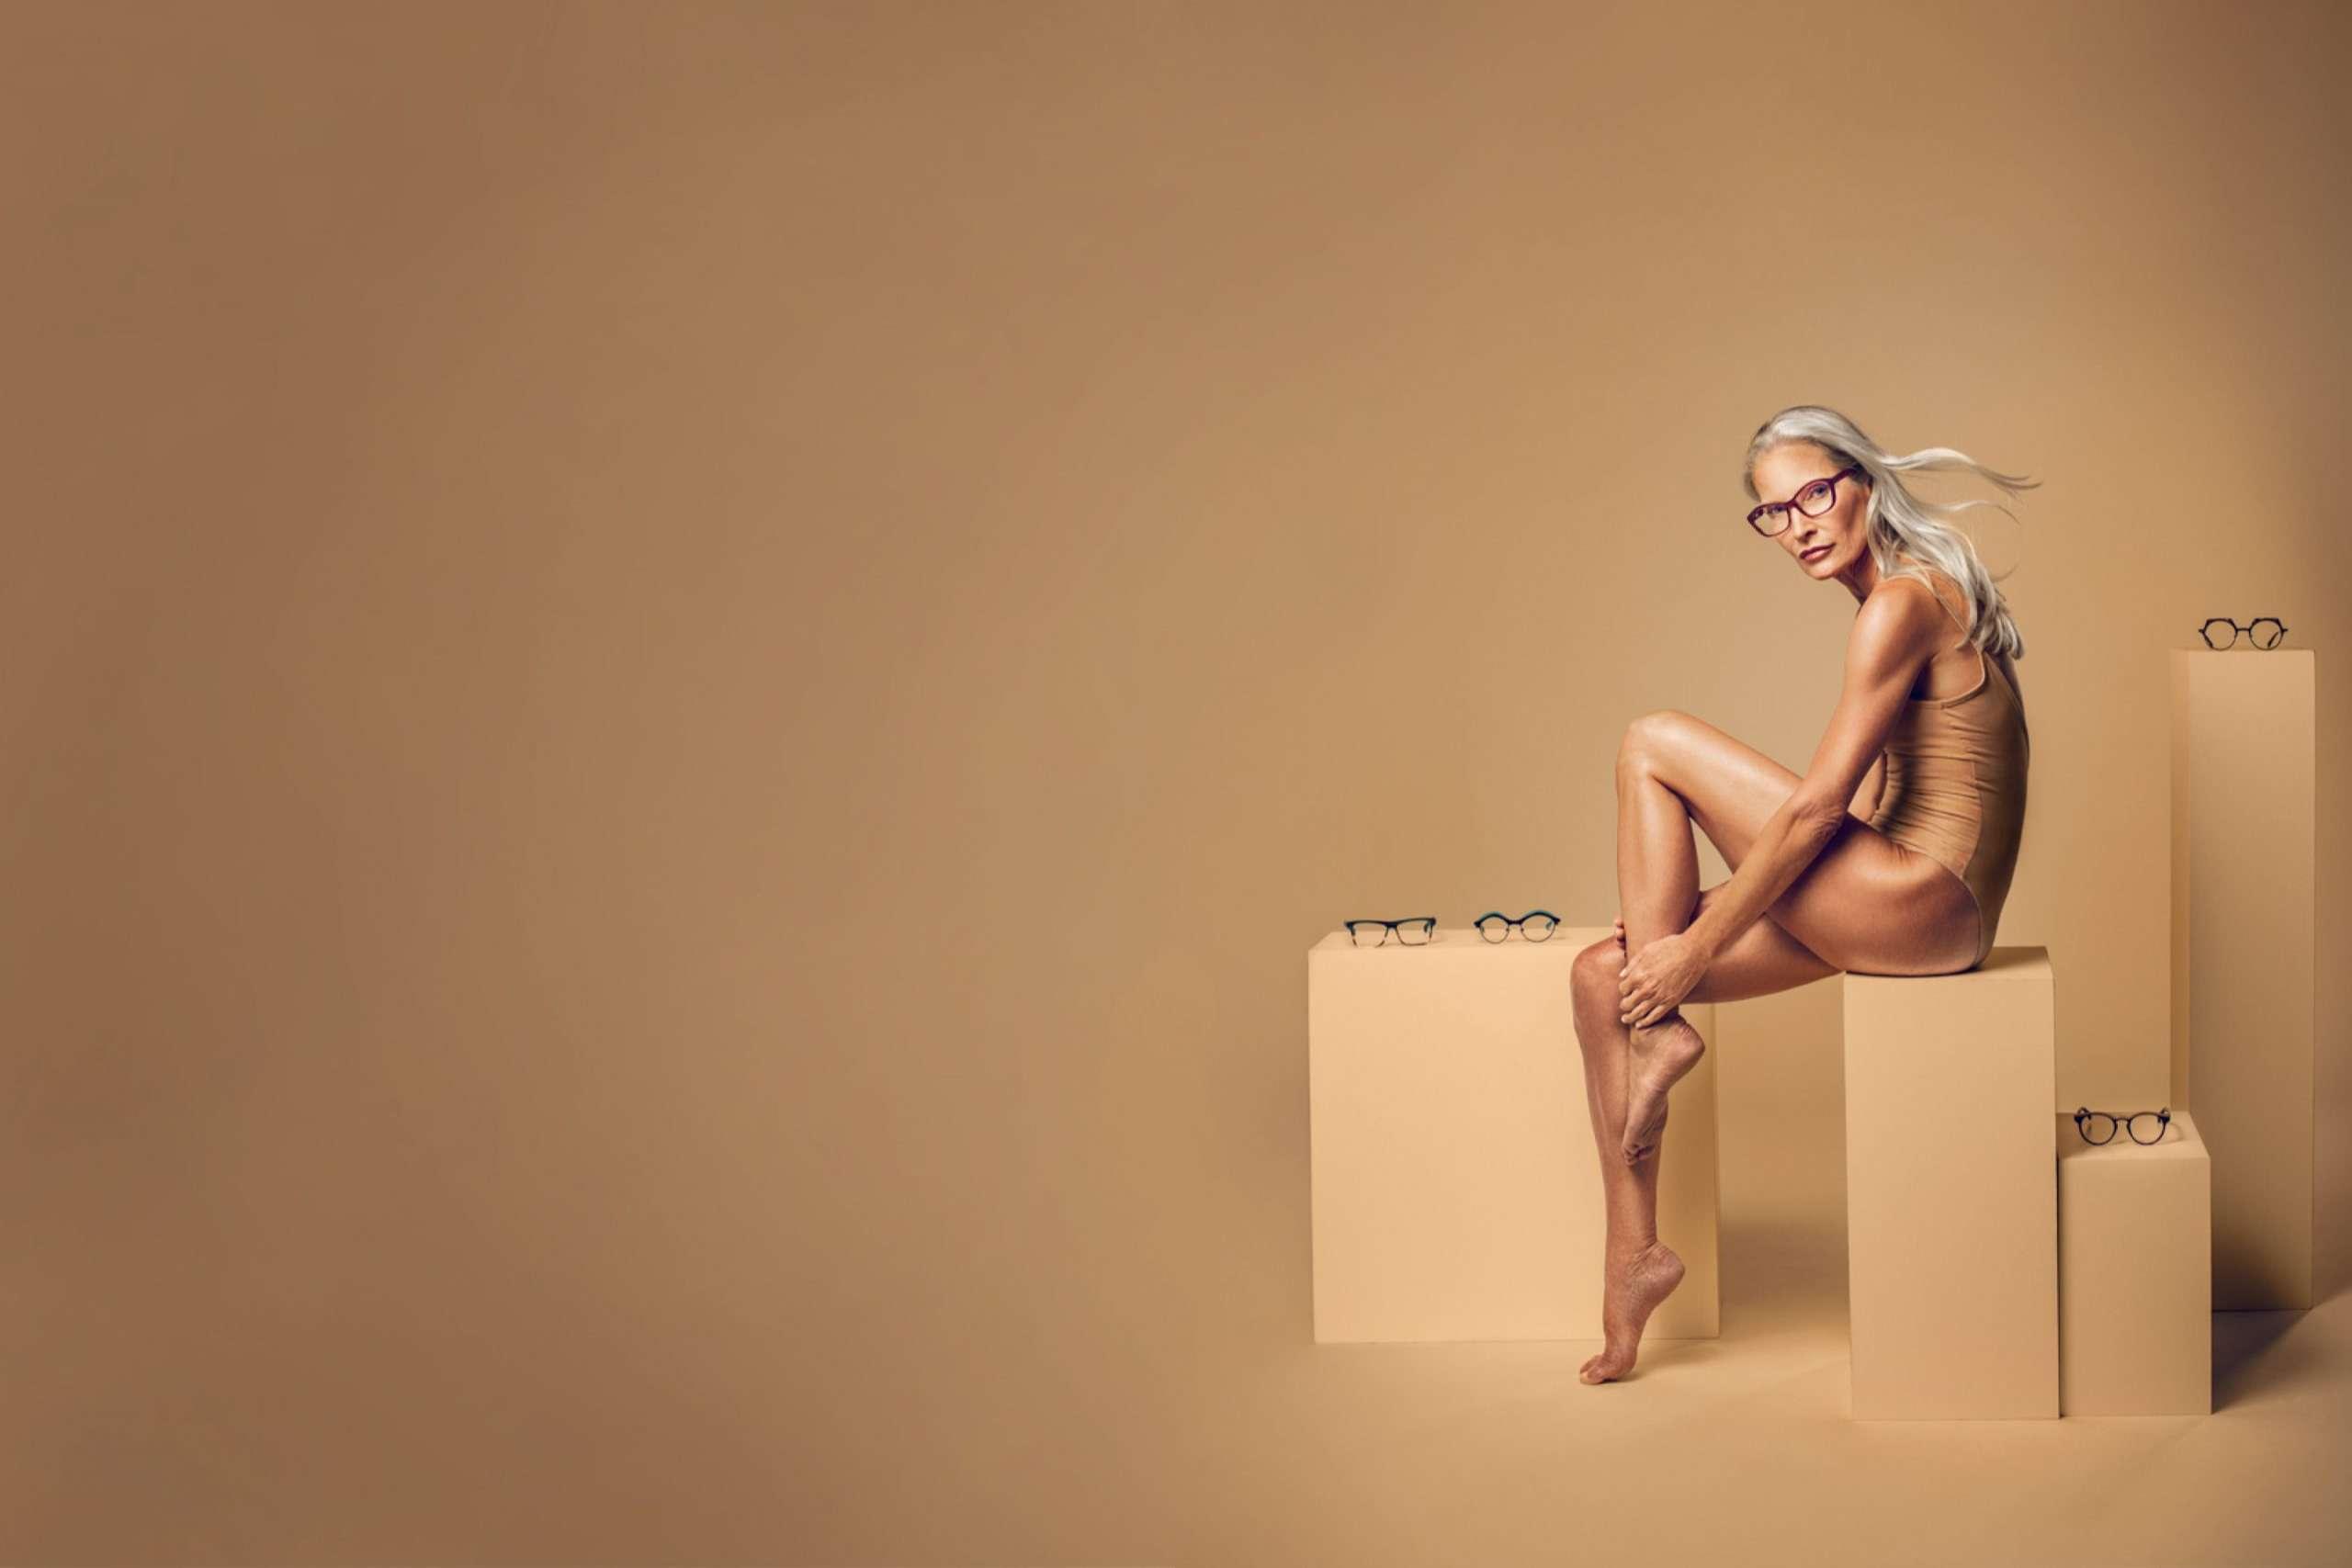 Mis à nu avec Optiboutiq